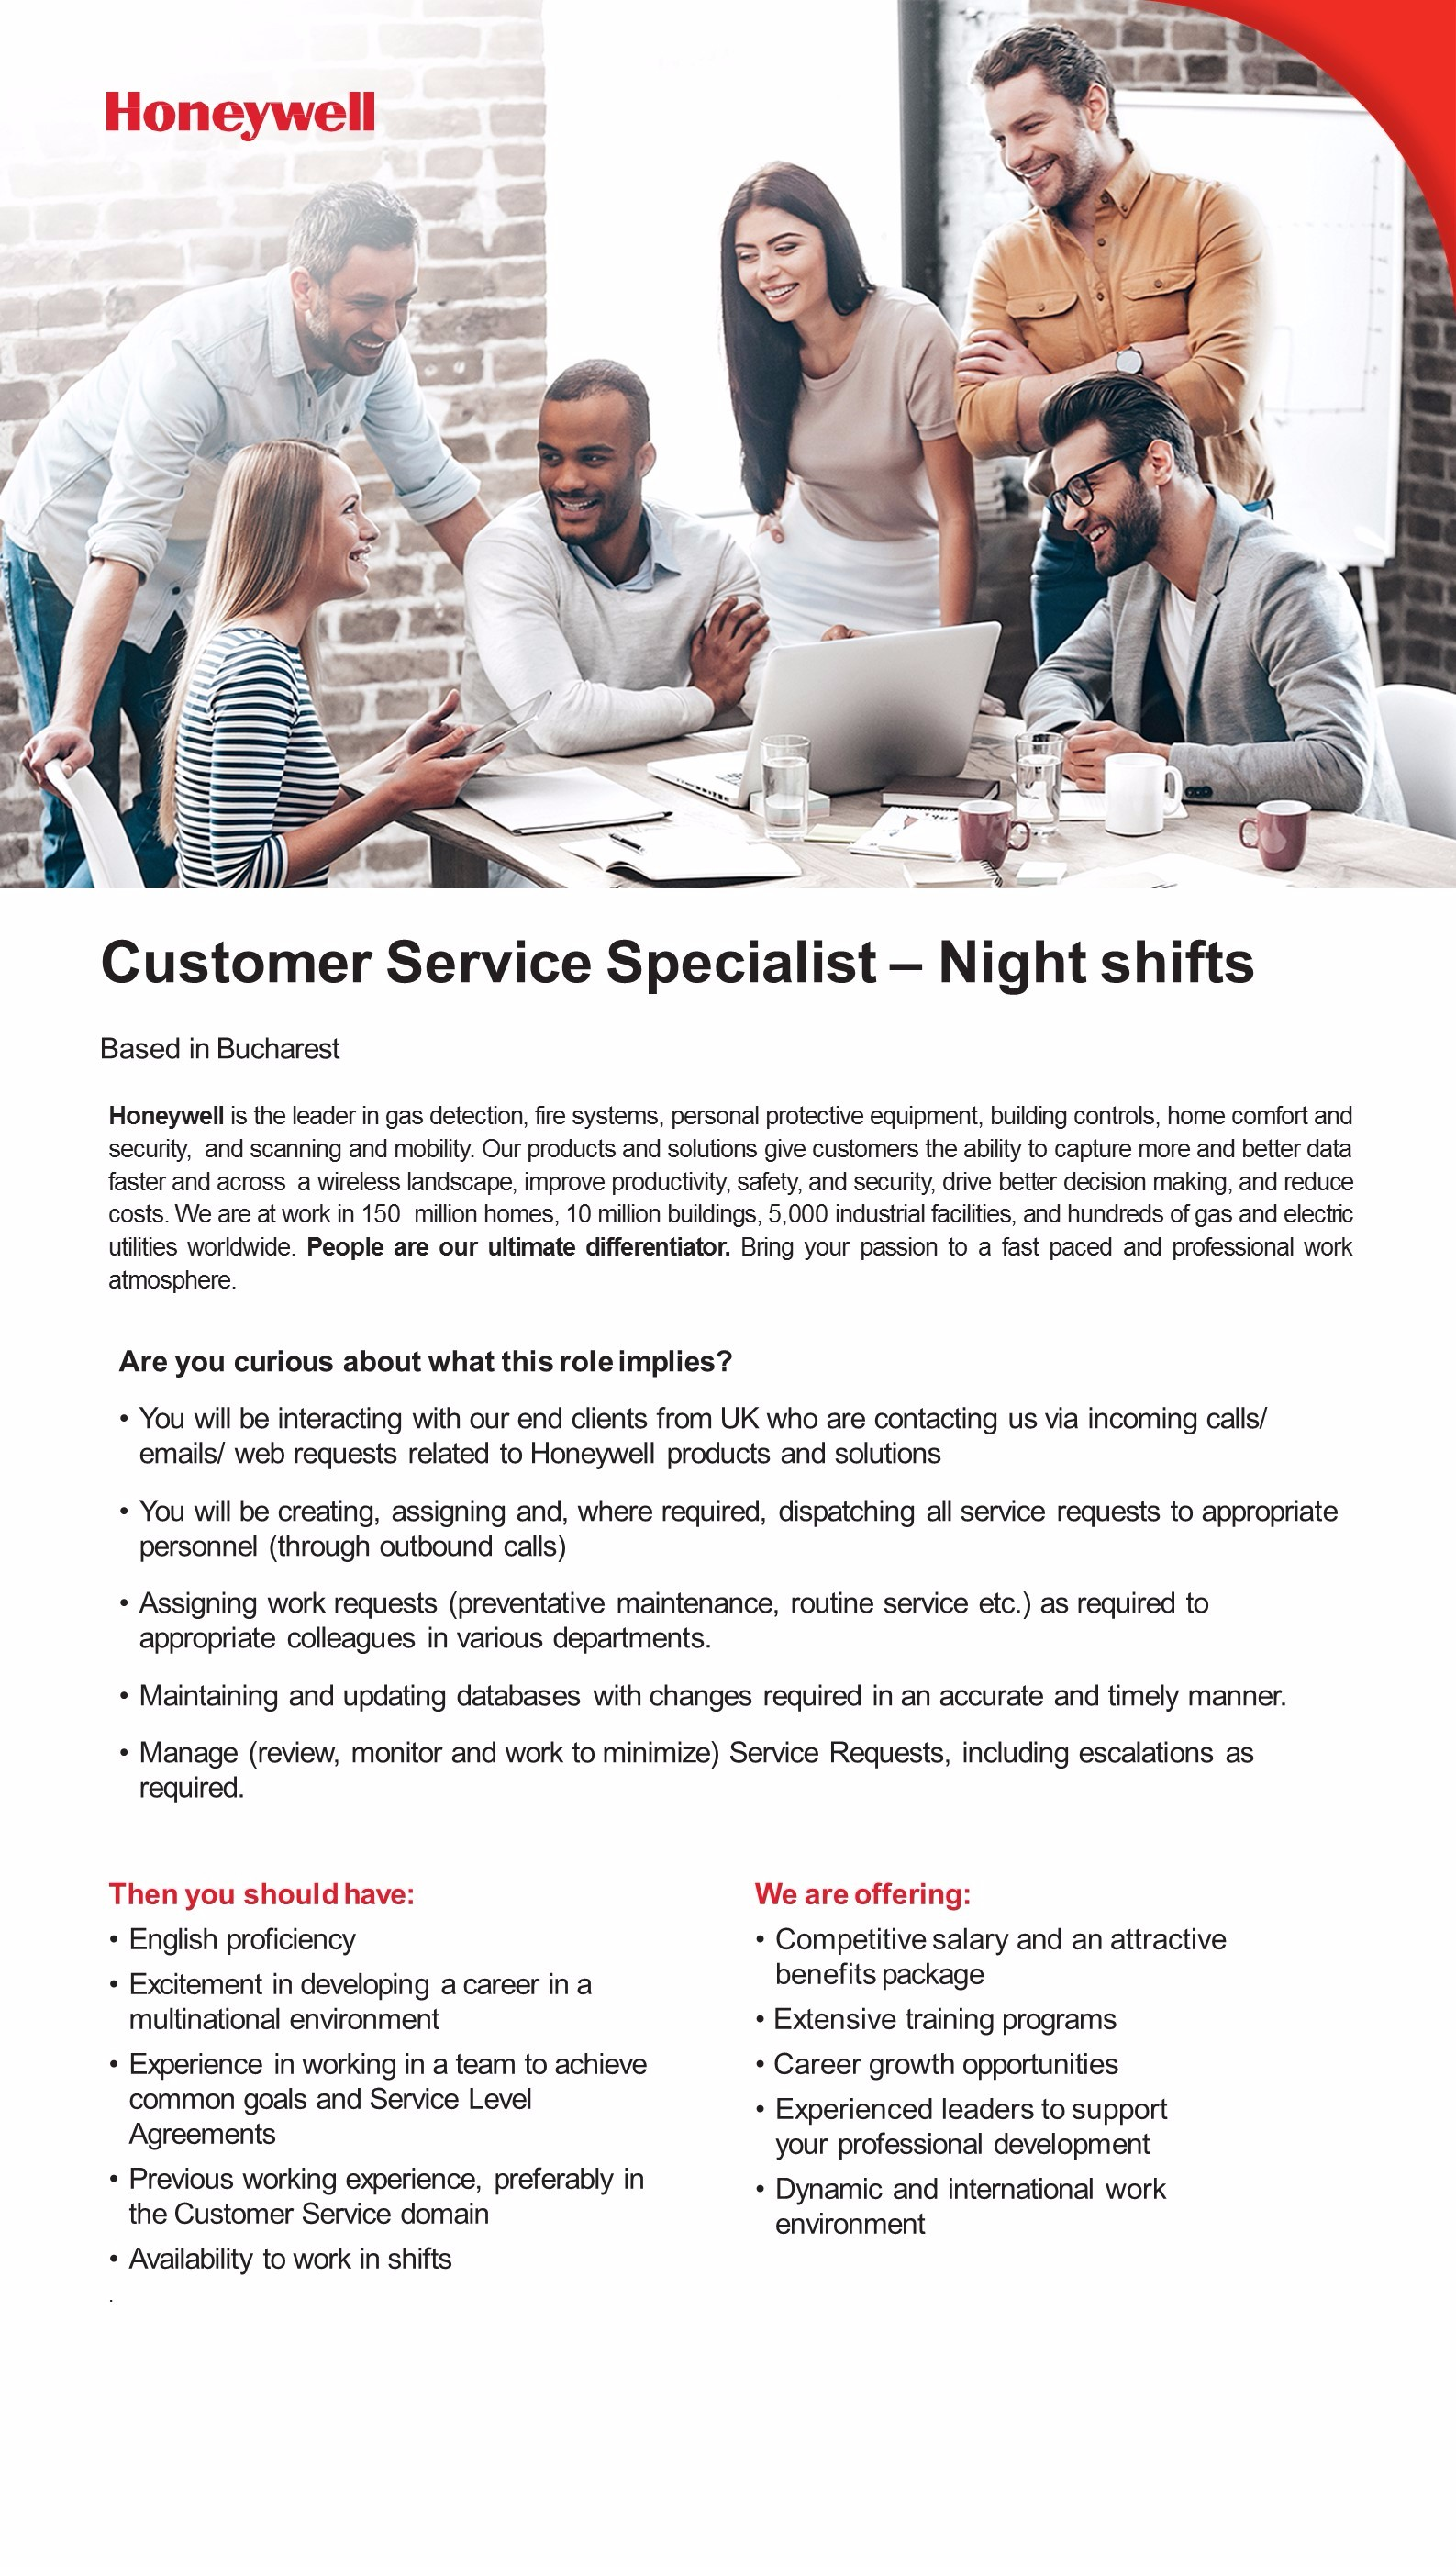 Customer Service Specialist – Night shifts